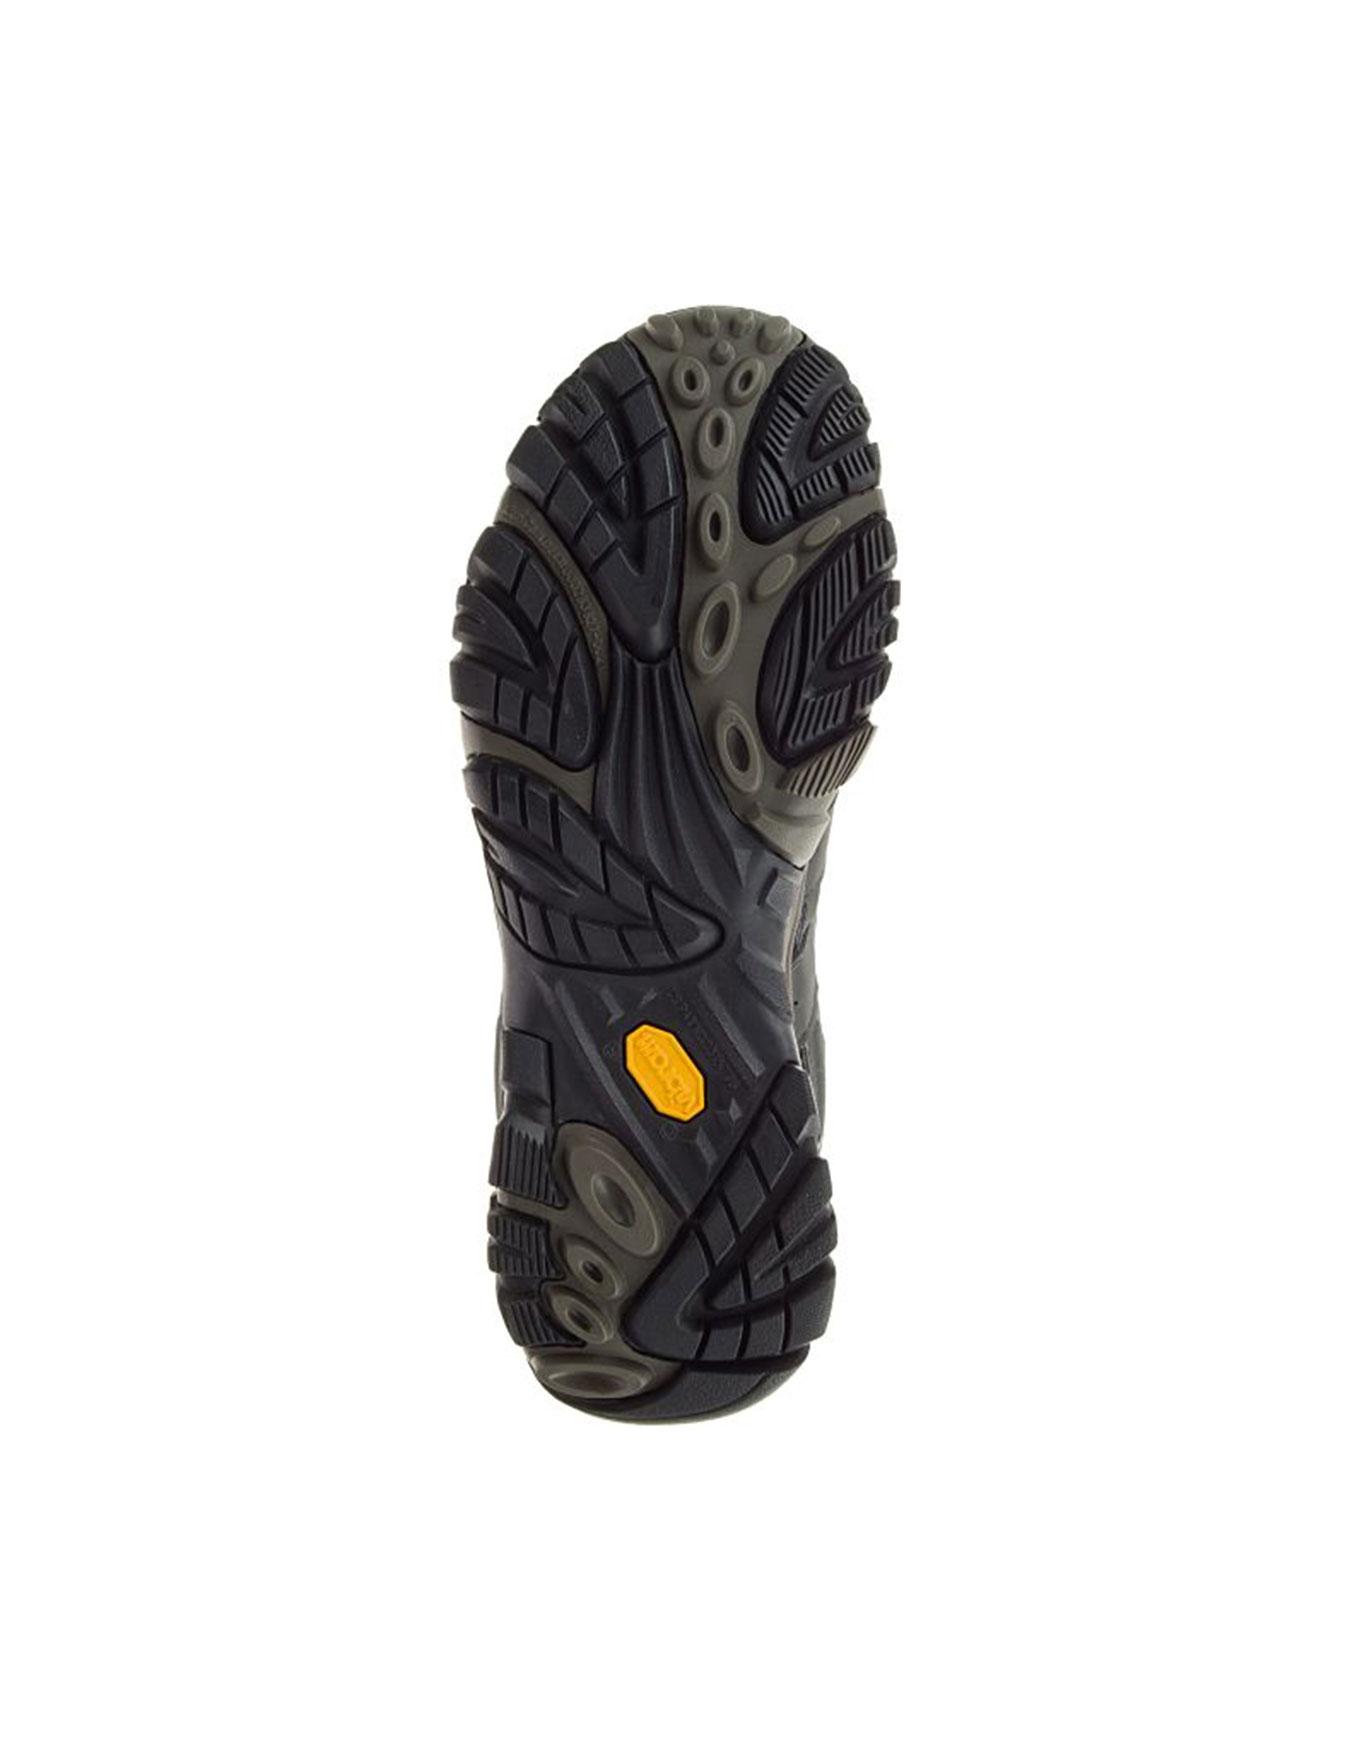 f156d204cf6 Moab 2 GTX Beluga Merrell   Chaussures randonnée homme   Snowleader